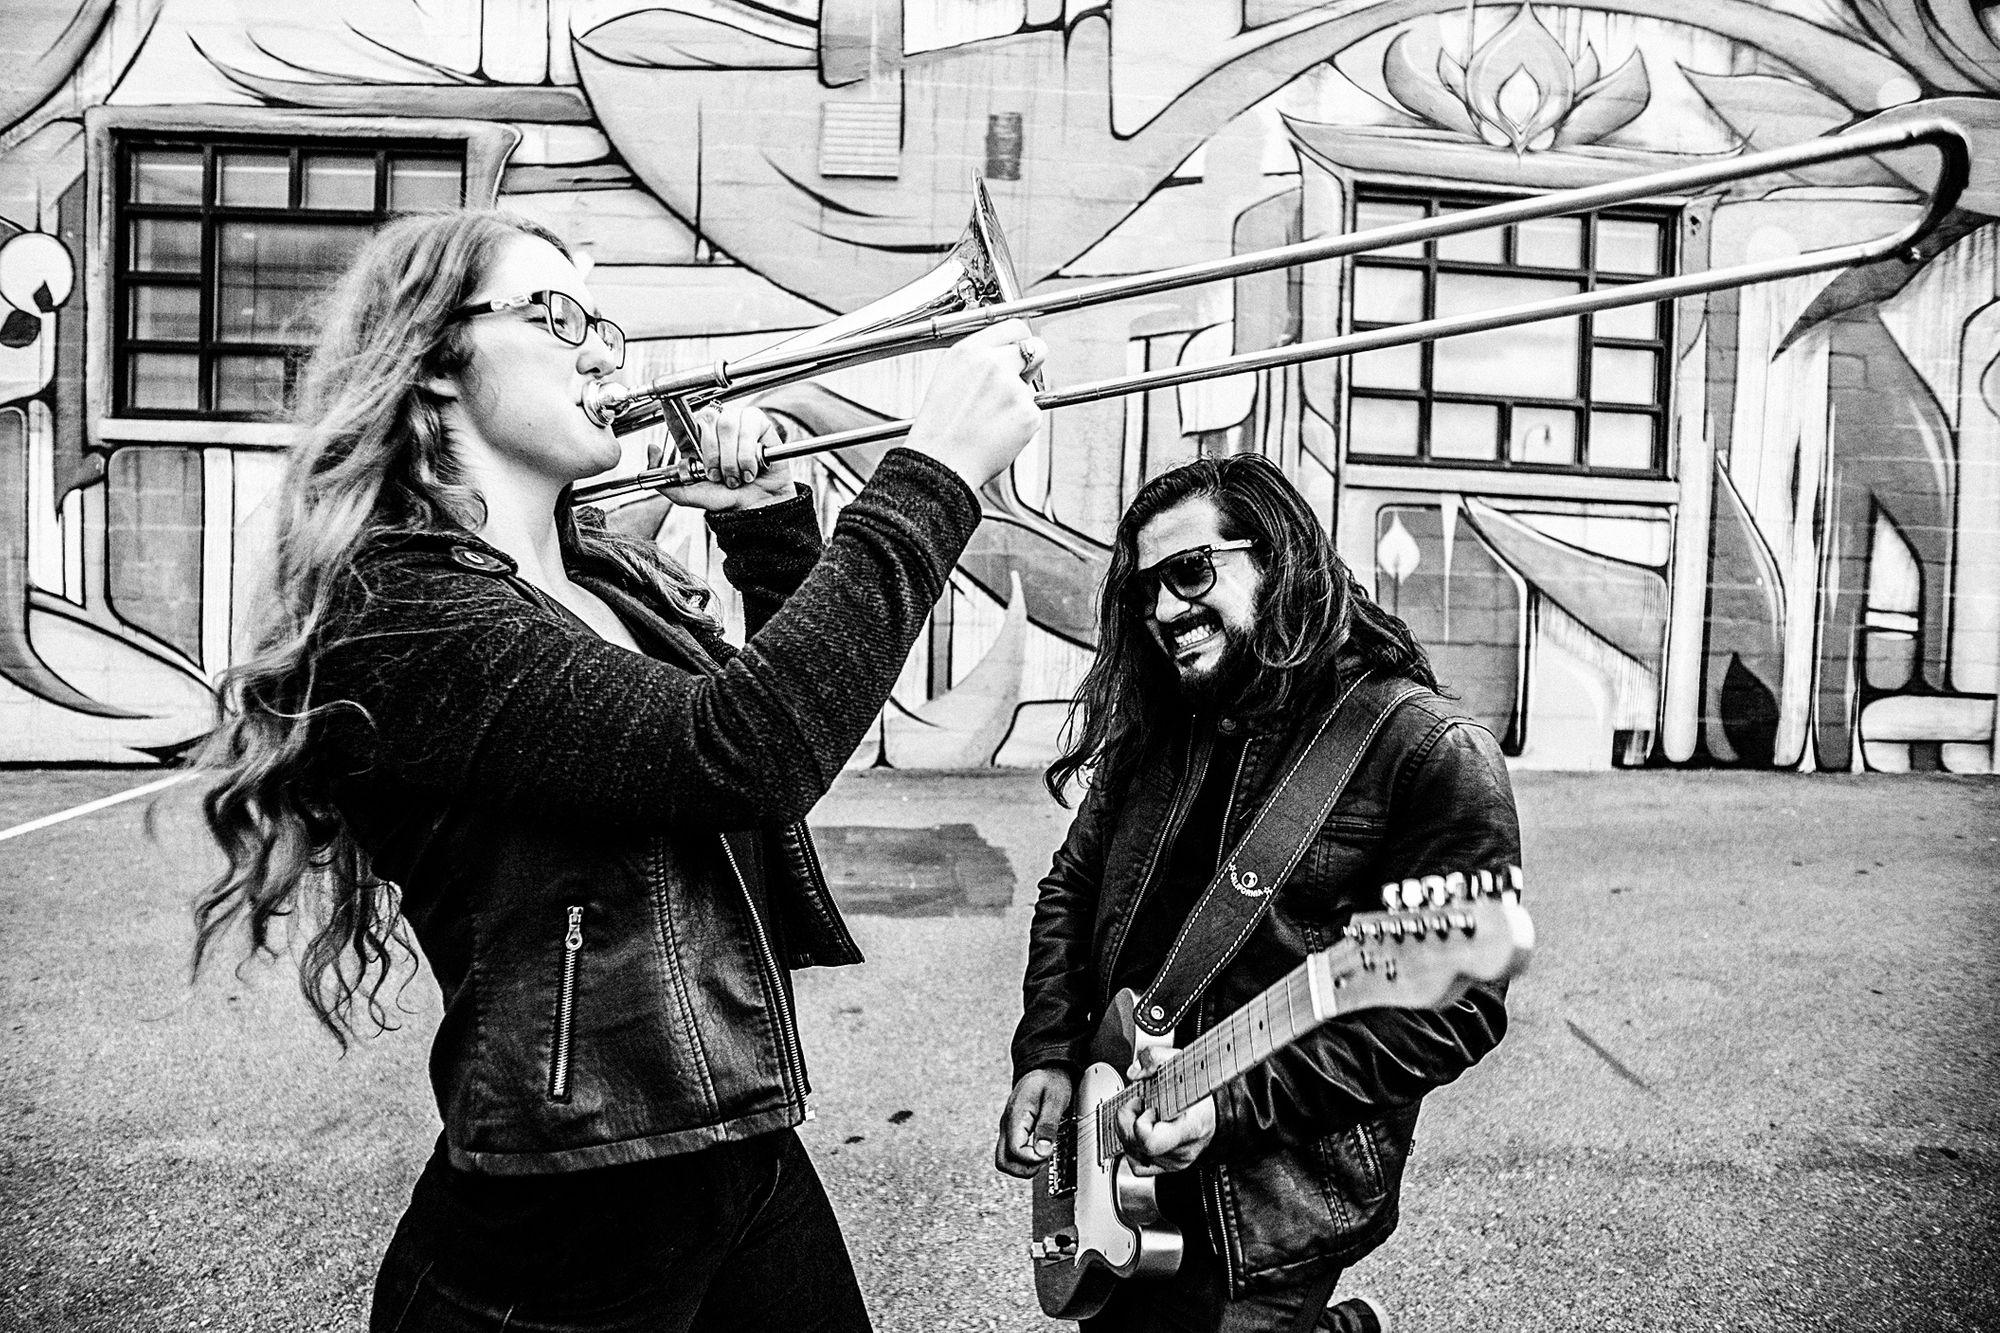 We Rock Together my love! ❤✨🎼🎷🎺🎻🎸✨❤ Trino & Hanna . . . . . . . . . #velasstudio #nashville #communityovercompetition #RooftopWedding #Madrid #Valdosta #engagement #weddingphotographer #georgiaphotographer #engagementphoto #musicians #Ventanas #huge #trumpet #creativeentreprenuer #soloverly #savannahweddingphotographer #southernweddings #atlantaweddingphotographer #charlestonweddingphotographer #guitar #Atlantawedding #southernbride